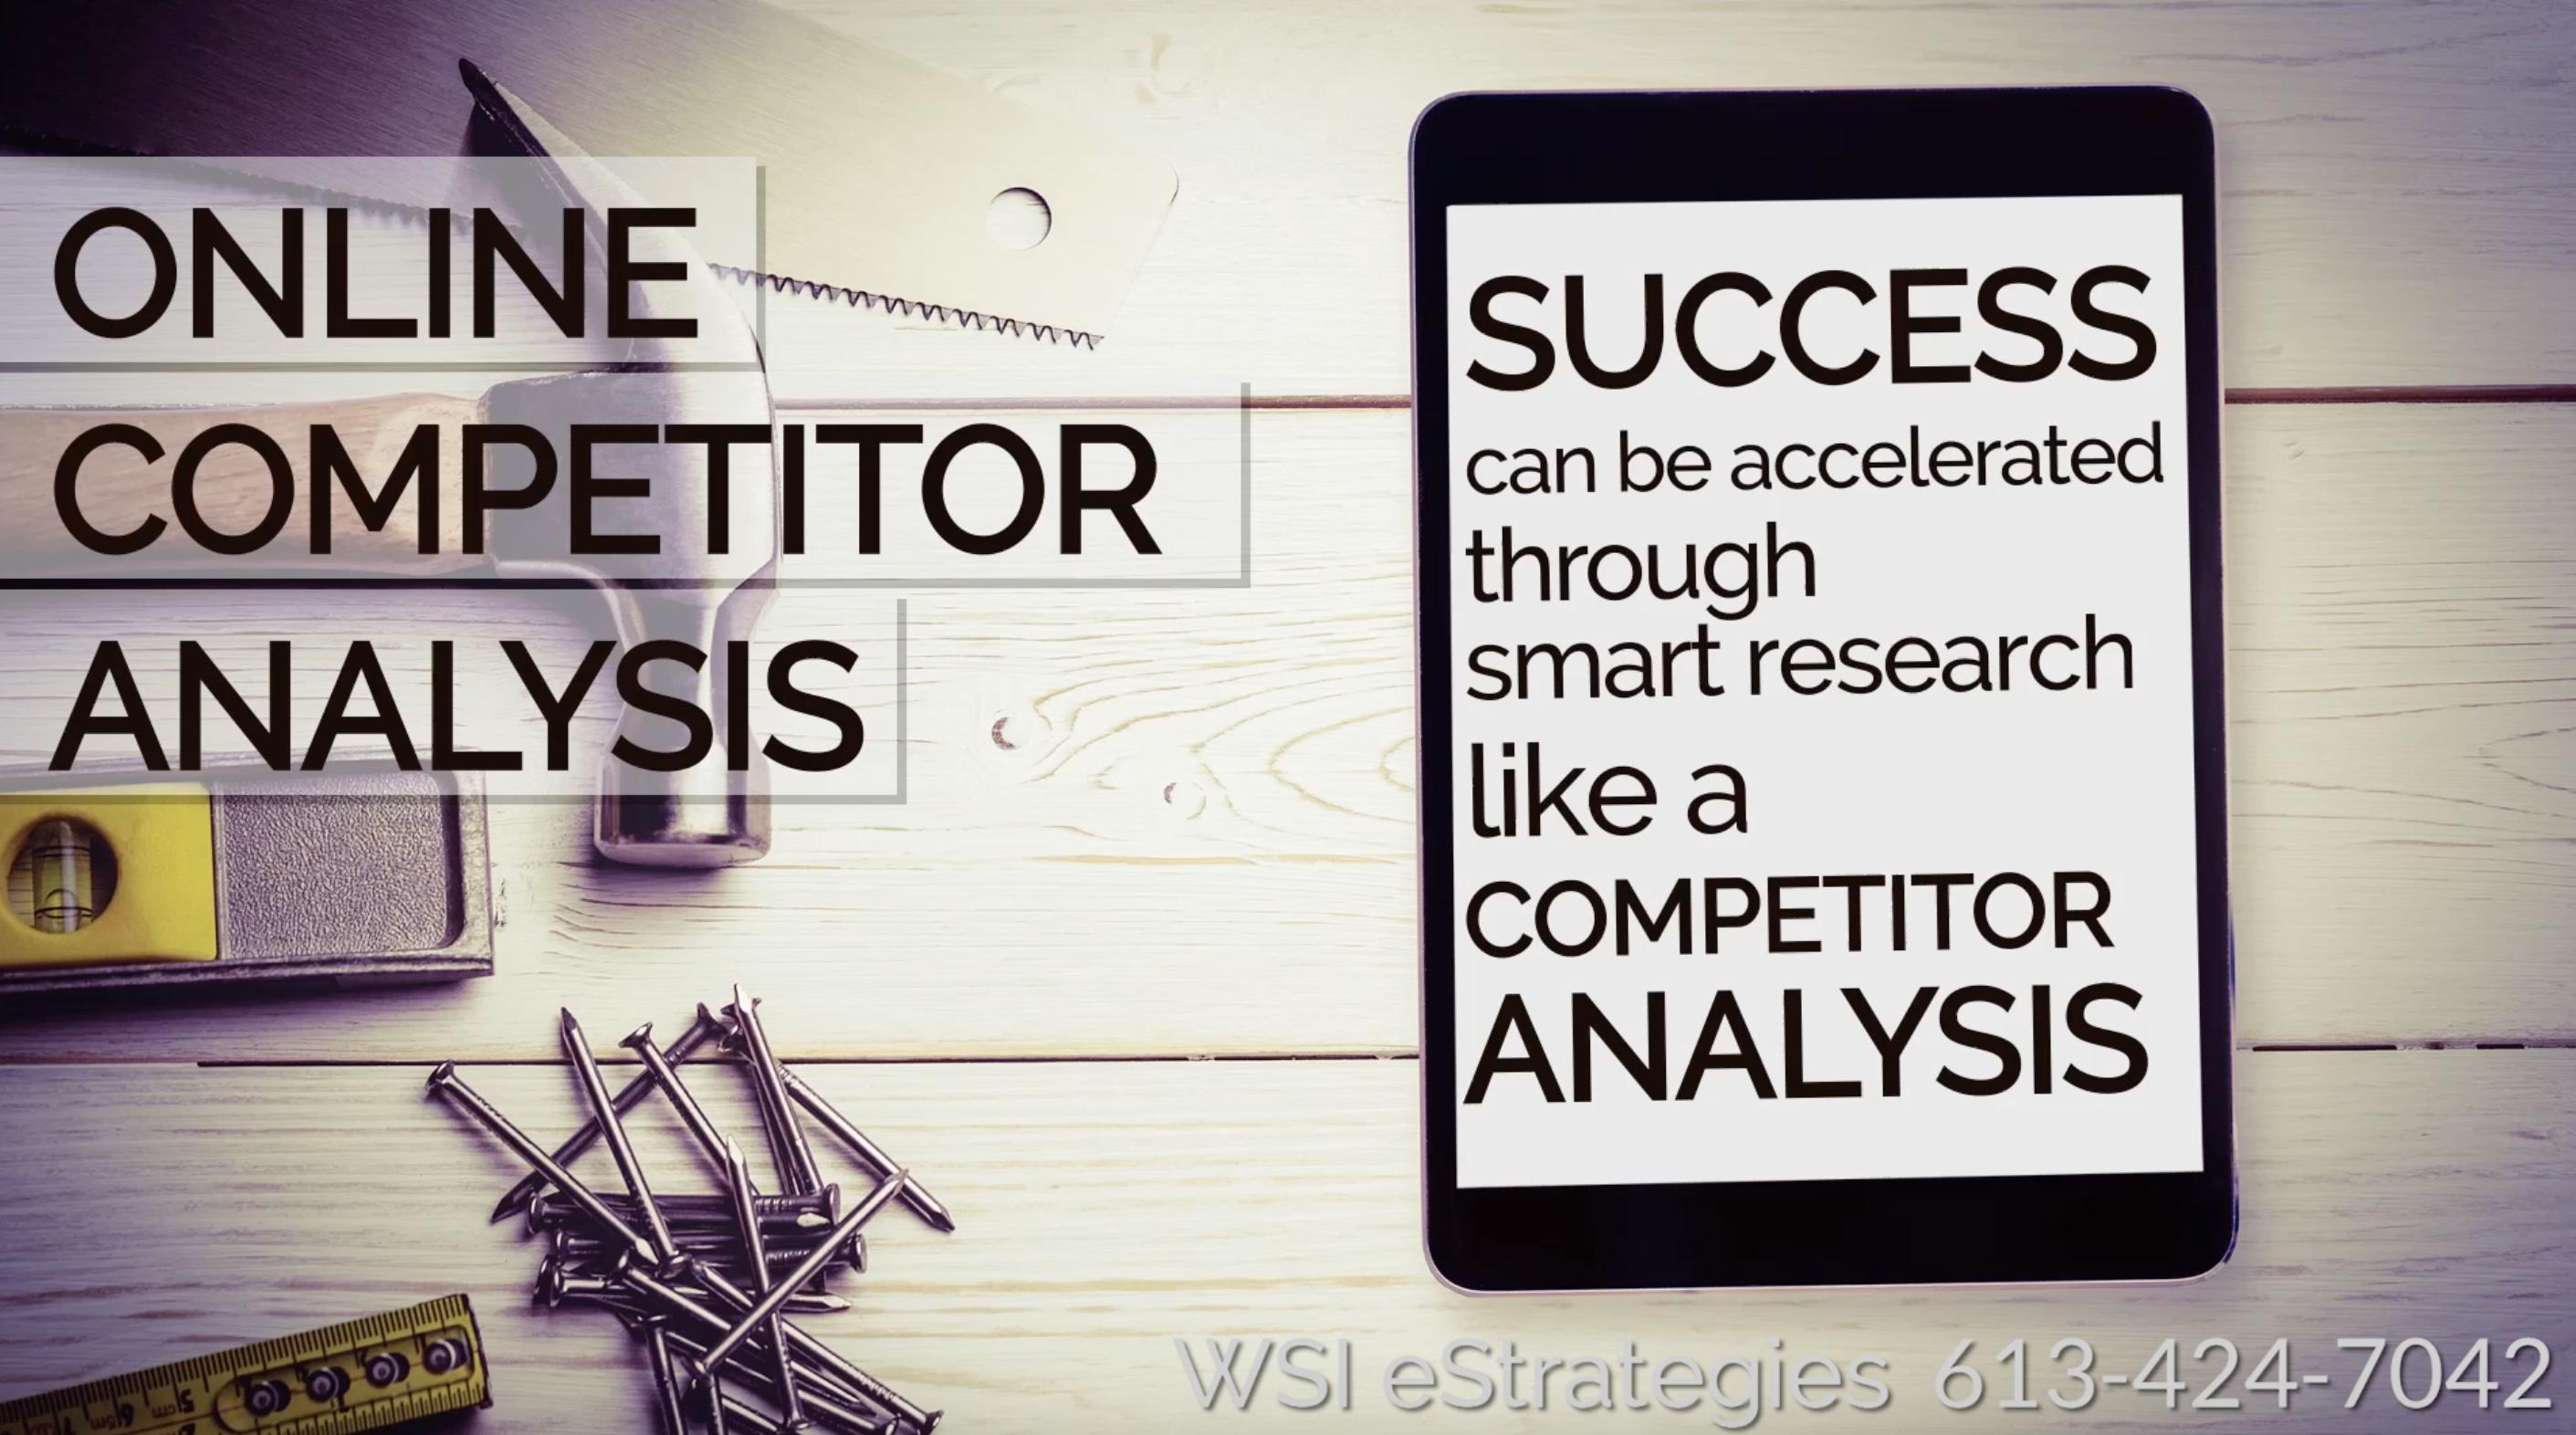 Competitor Analysis Ottawa